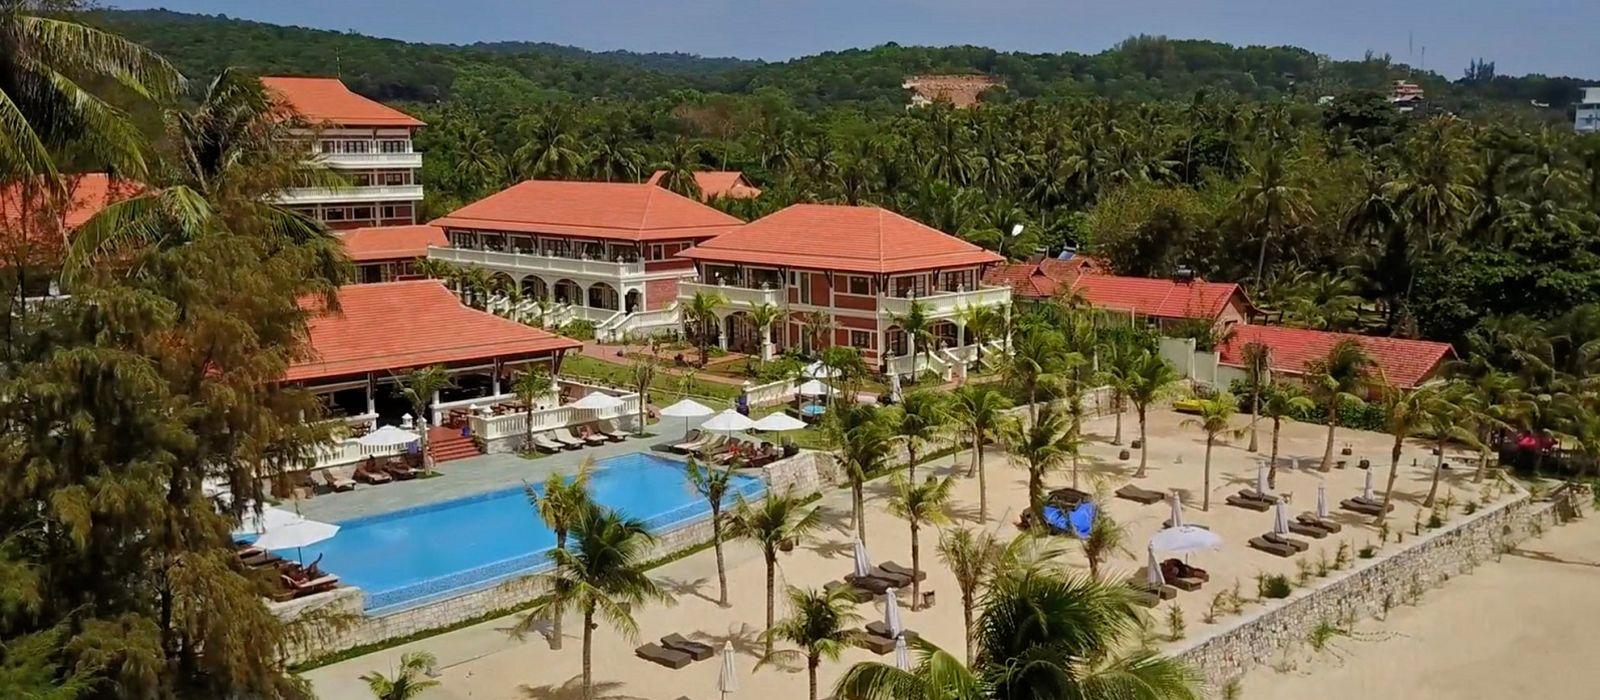 Hotel Cassia Cottage Vietnam